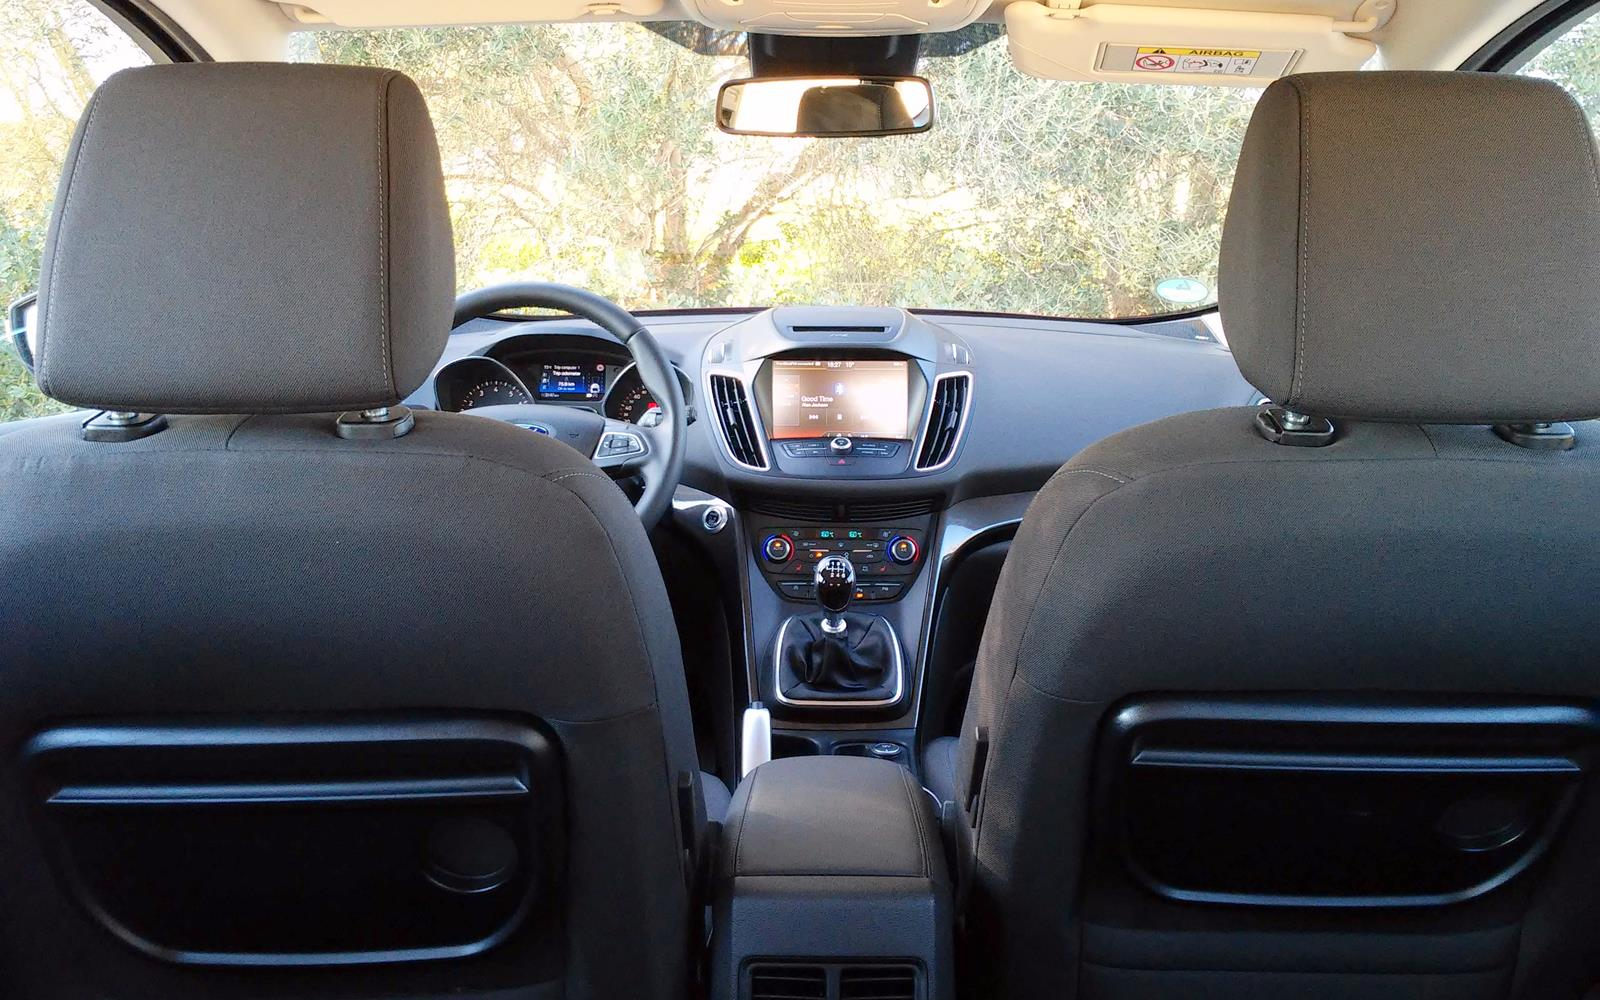 Ford C-Max 2015 Interior